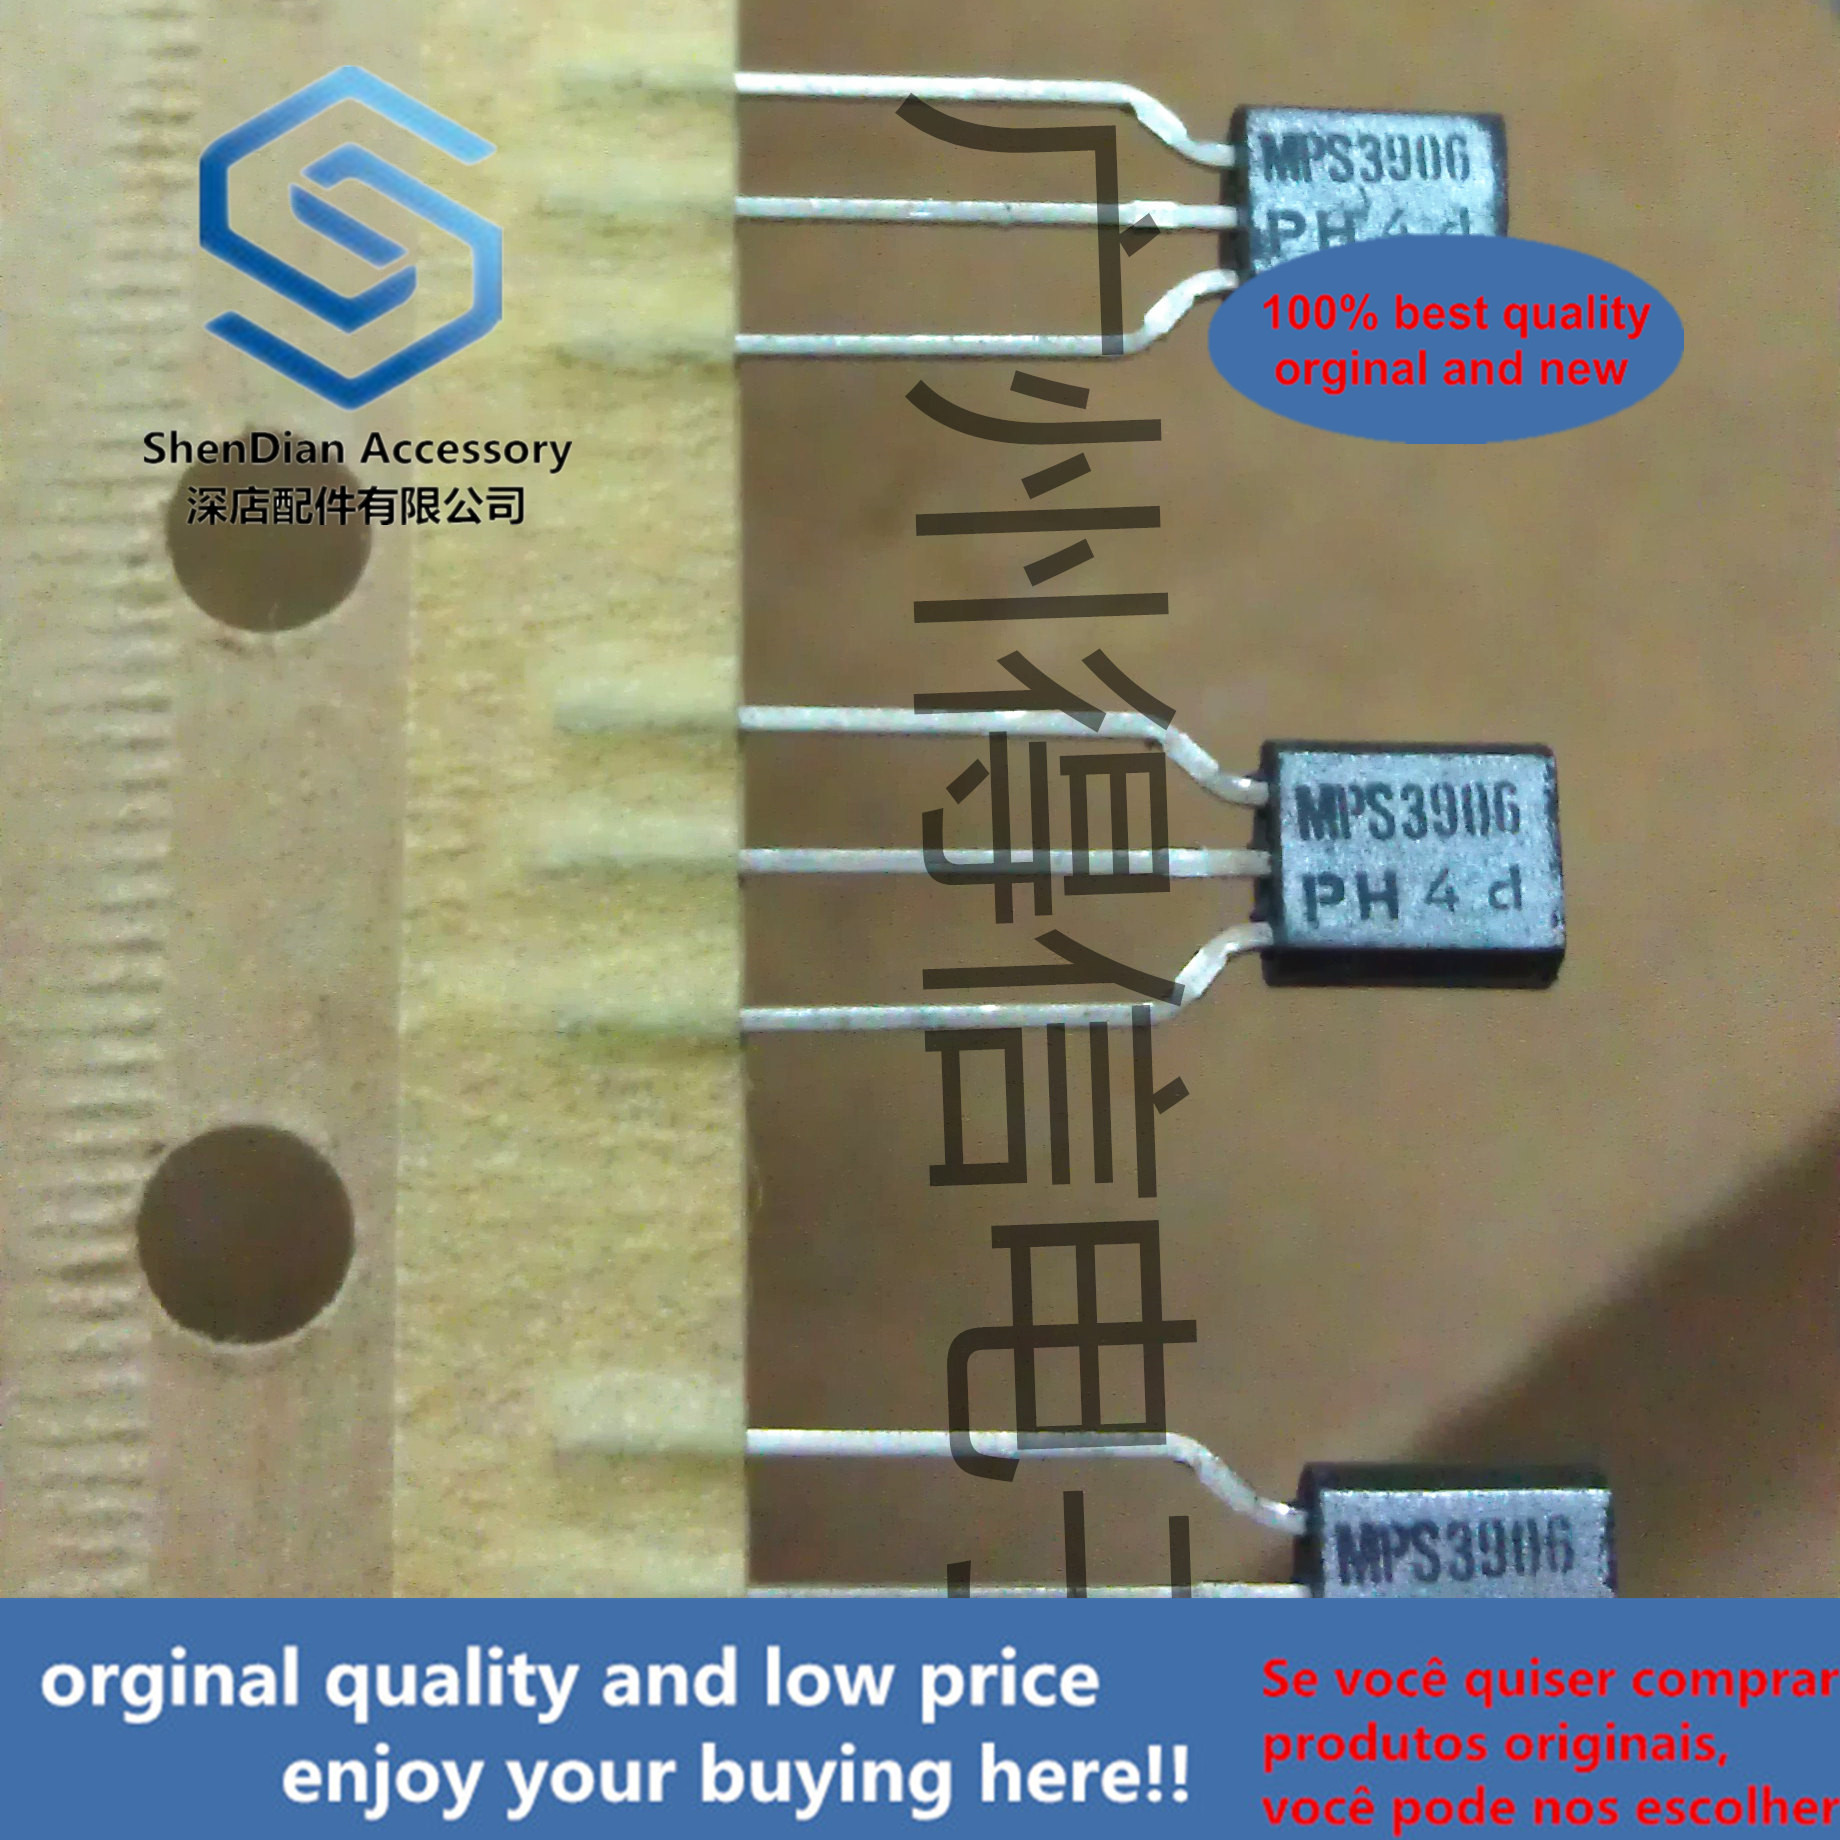 30pcs 100% Orginal New MPS3906 2N3906 TO-92 General Purpose Transistor(PNP Silicon) Real Photo